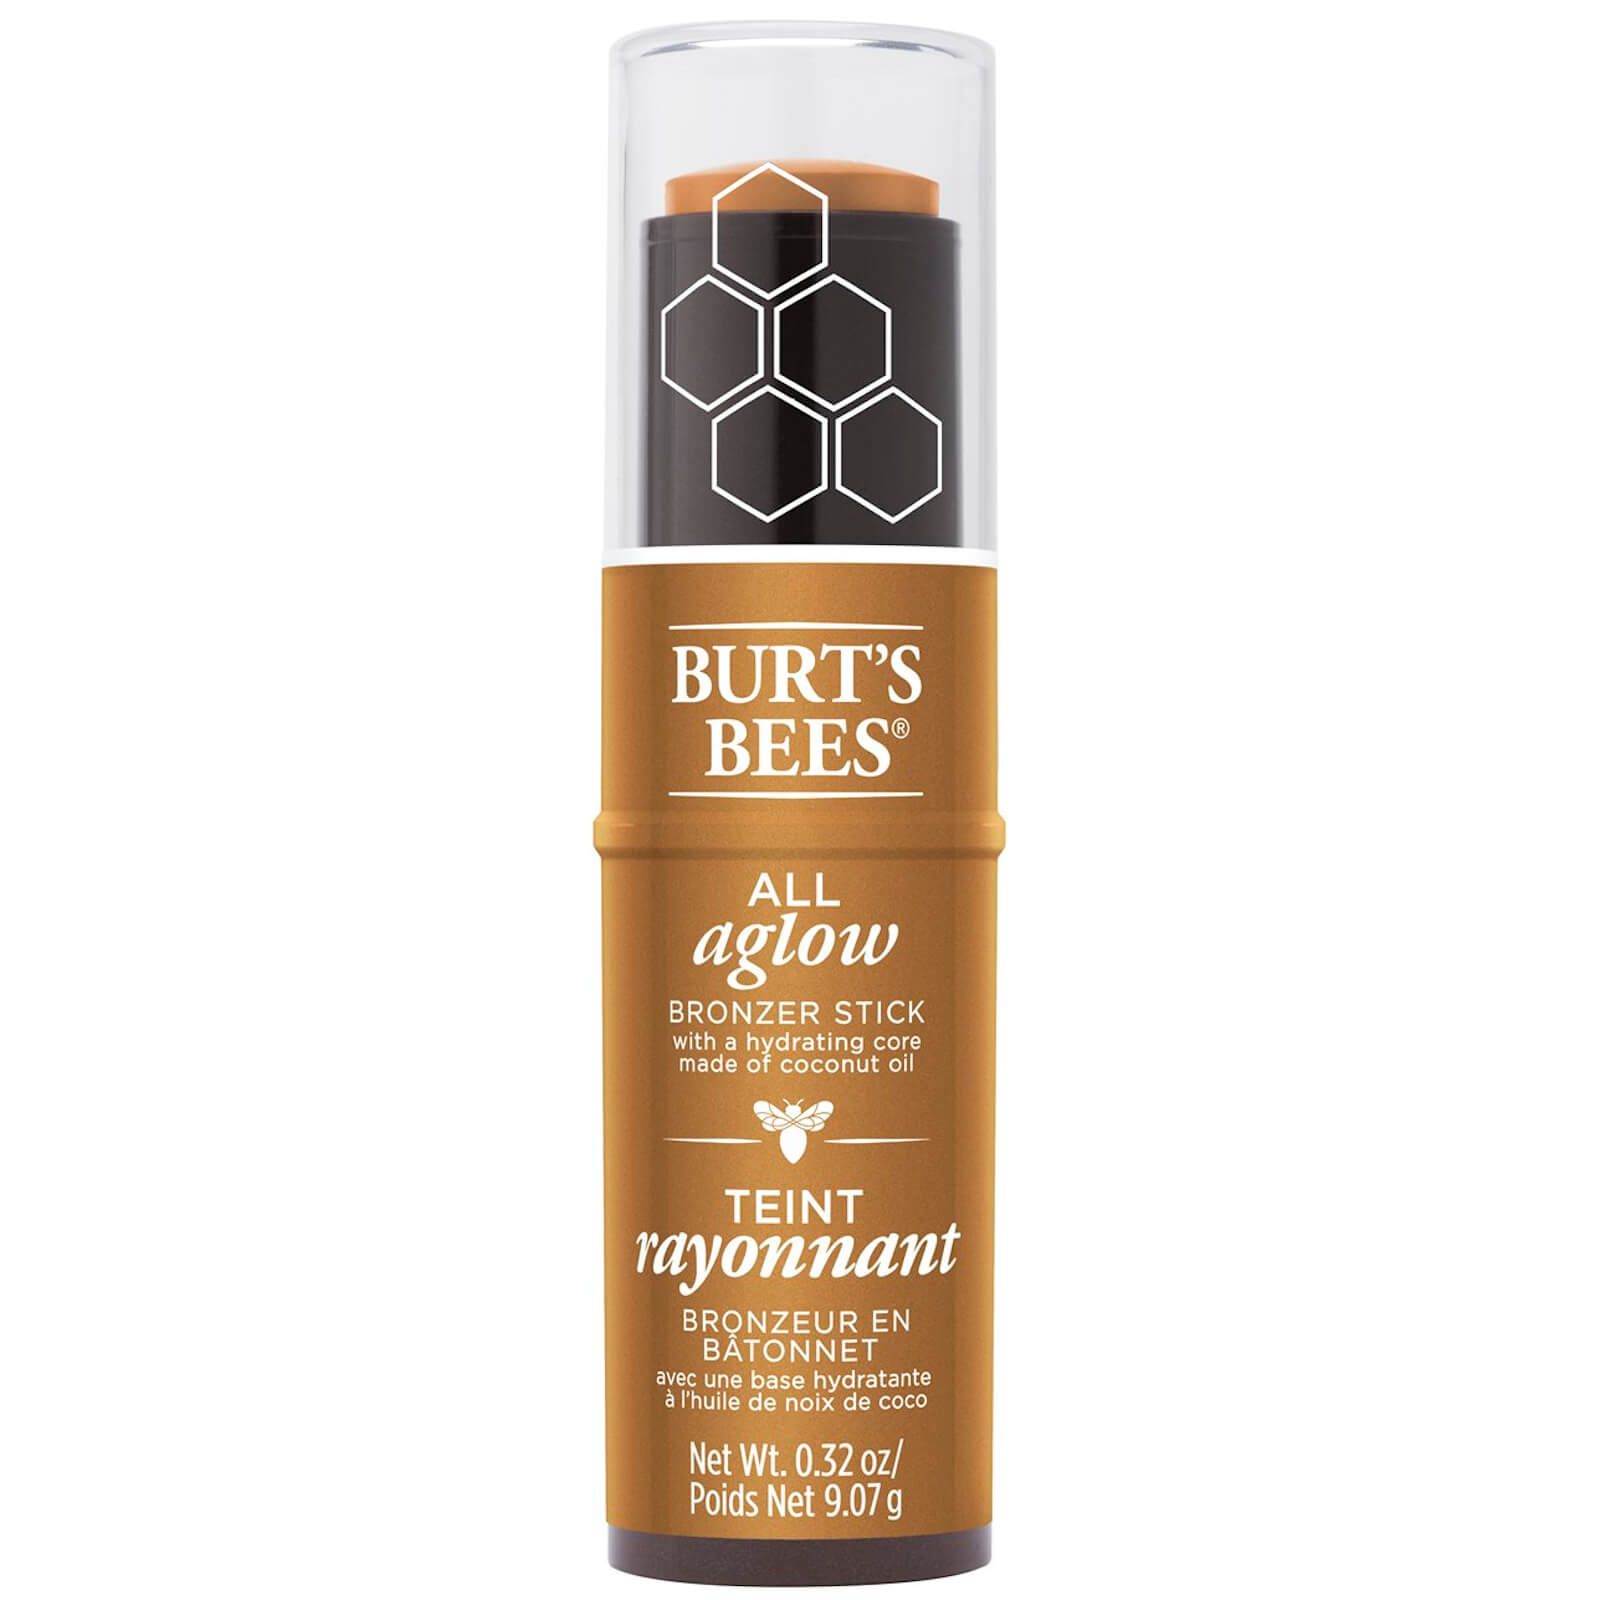 Burt's Bees 100% Natural All Aglow Highlighter Stick 8.5g (Various Shades) - Bronze Splash